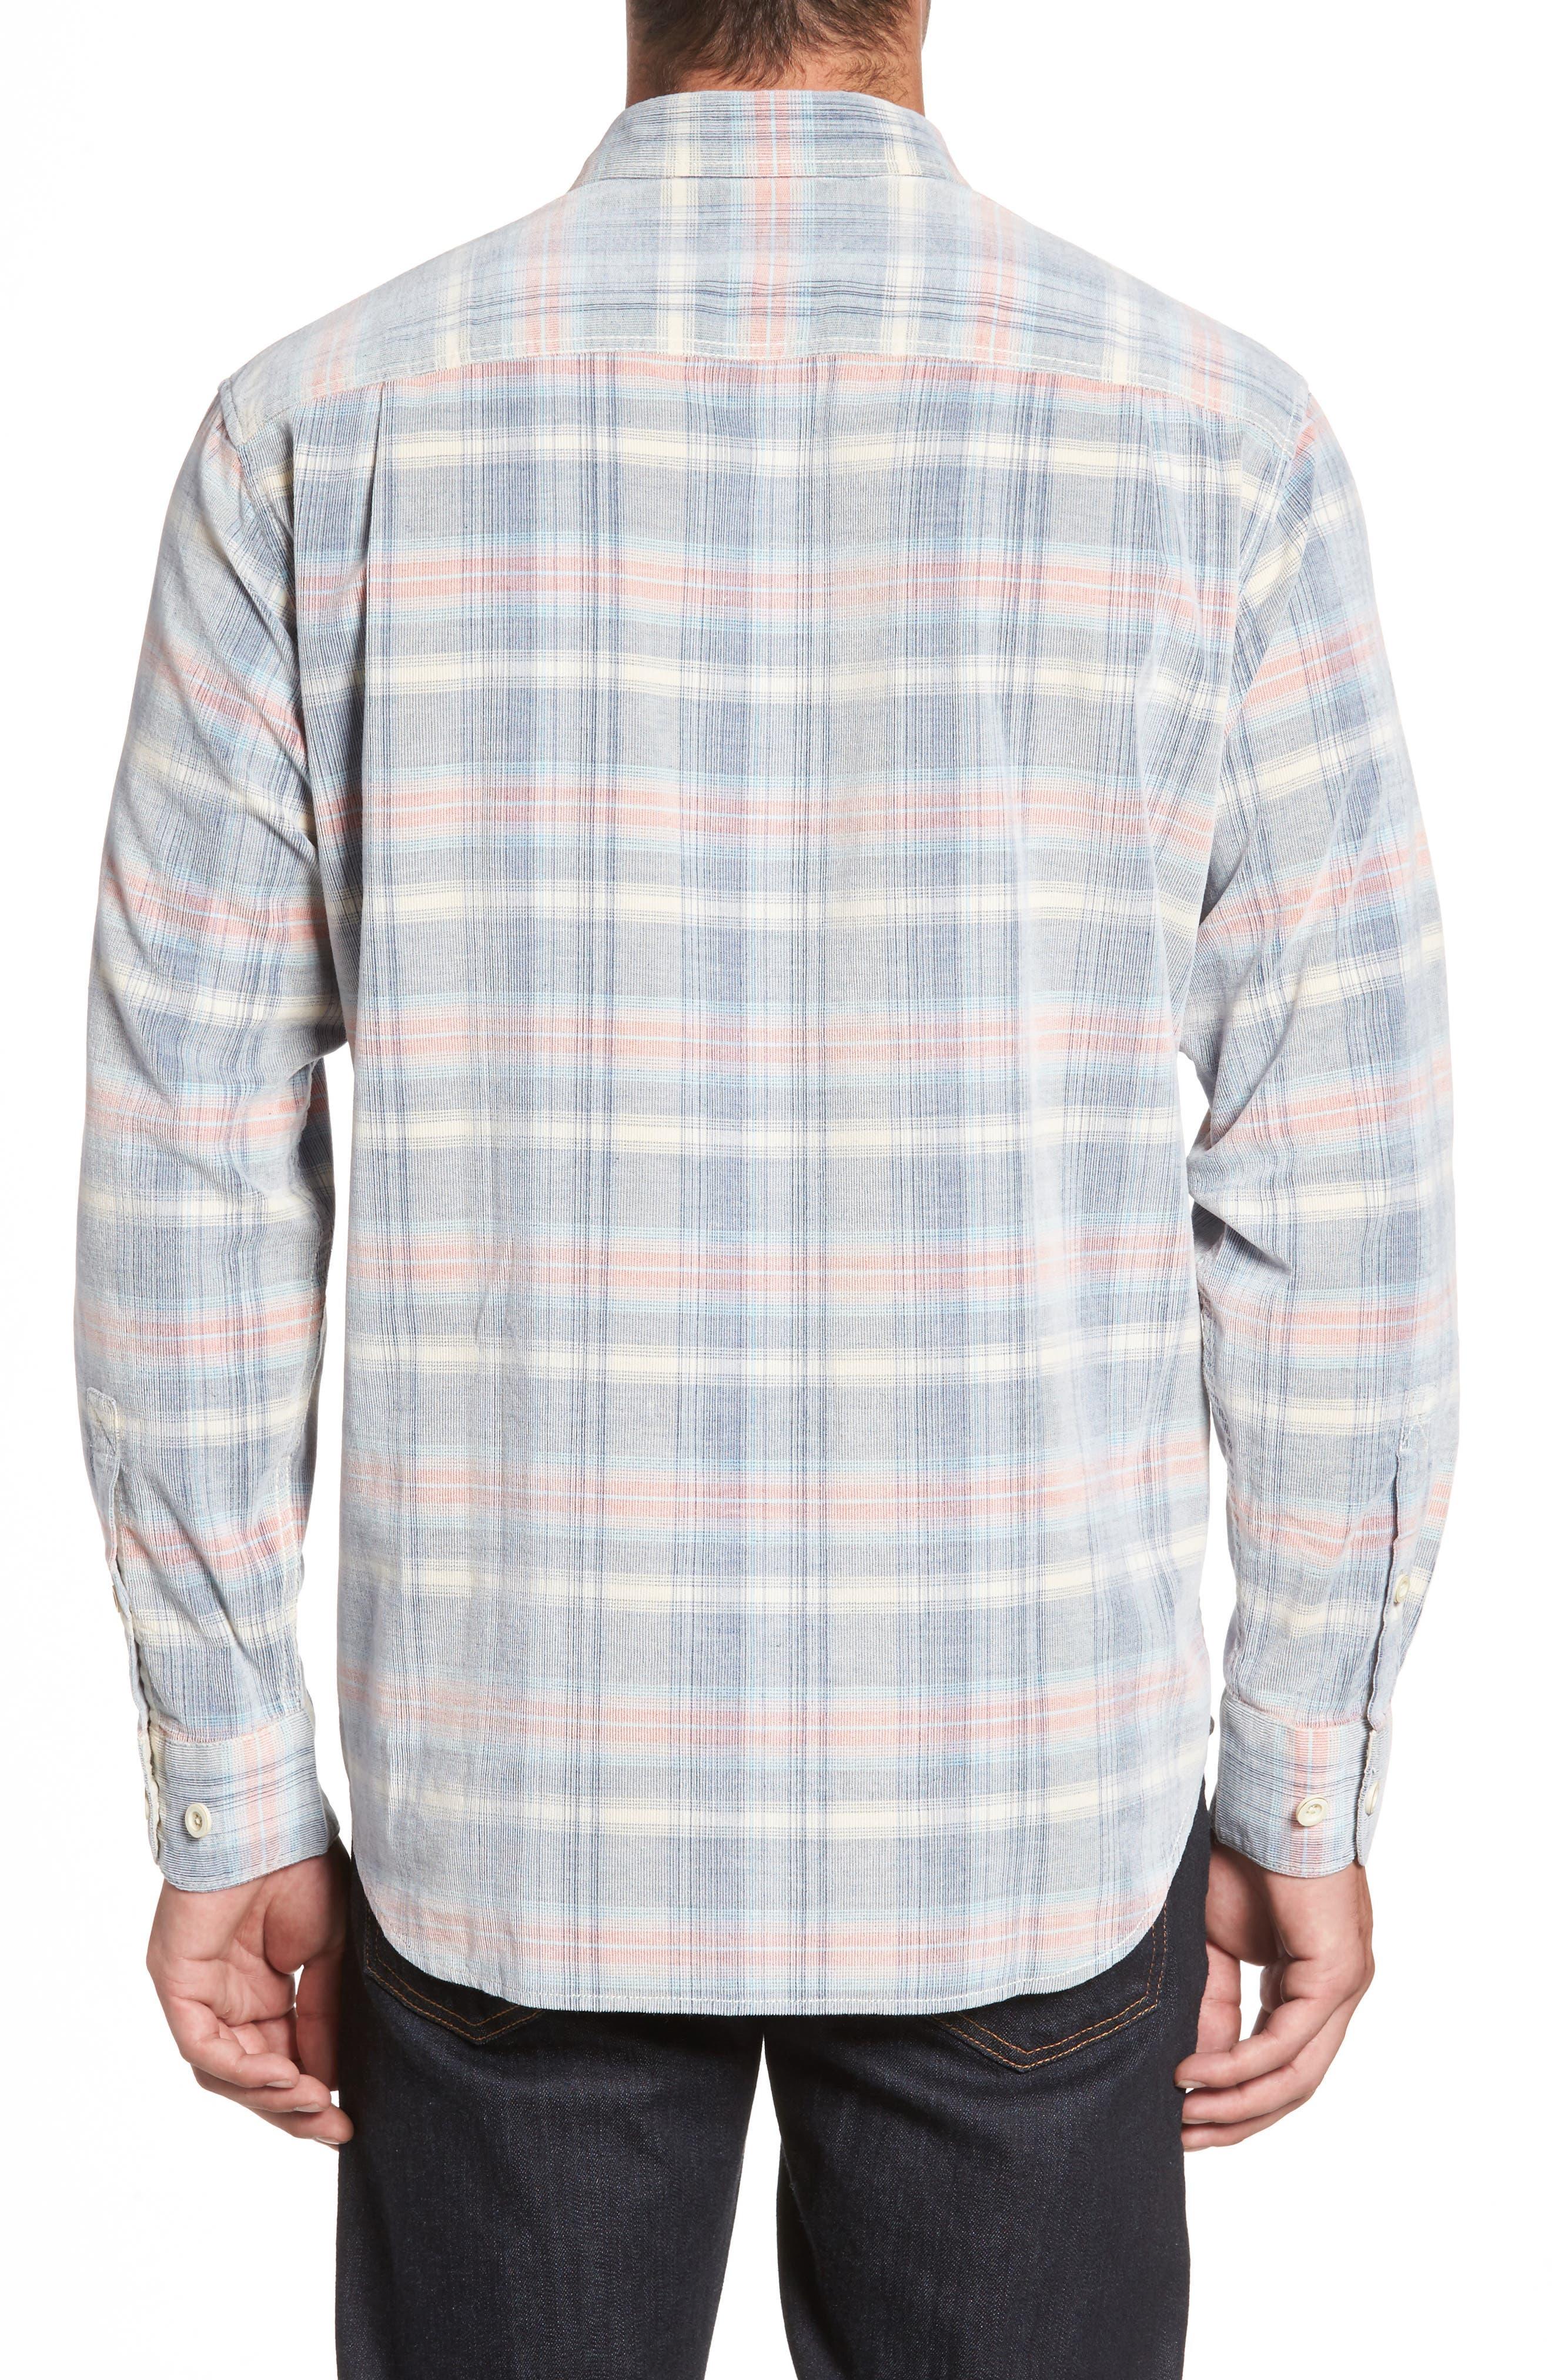 Cordwalk Plaid Plaid Sport Shirt,                             Alternate thumbnail 2, color,                             400